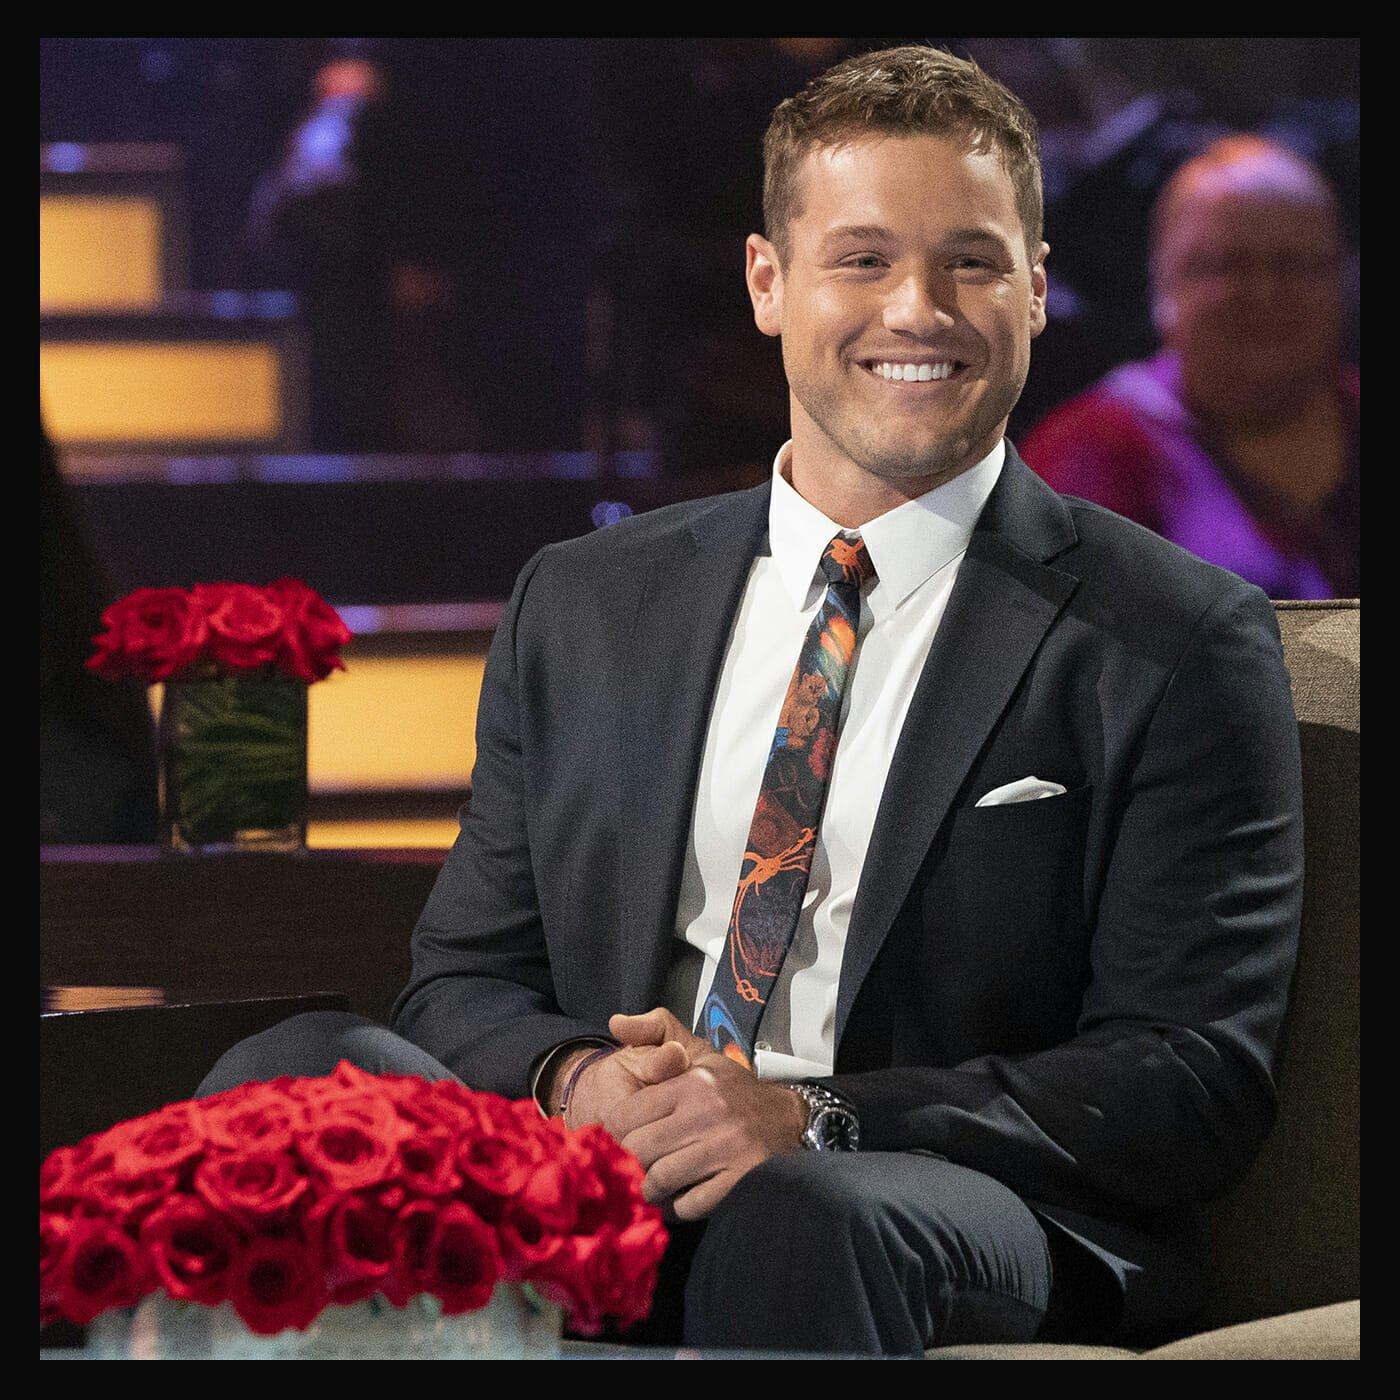 bachelor-season-23-finale-man-repeller-feature-1.jpg